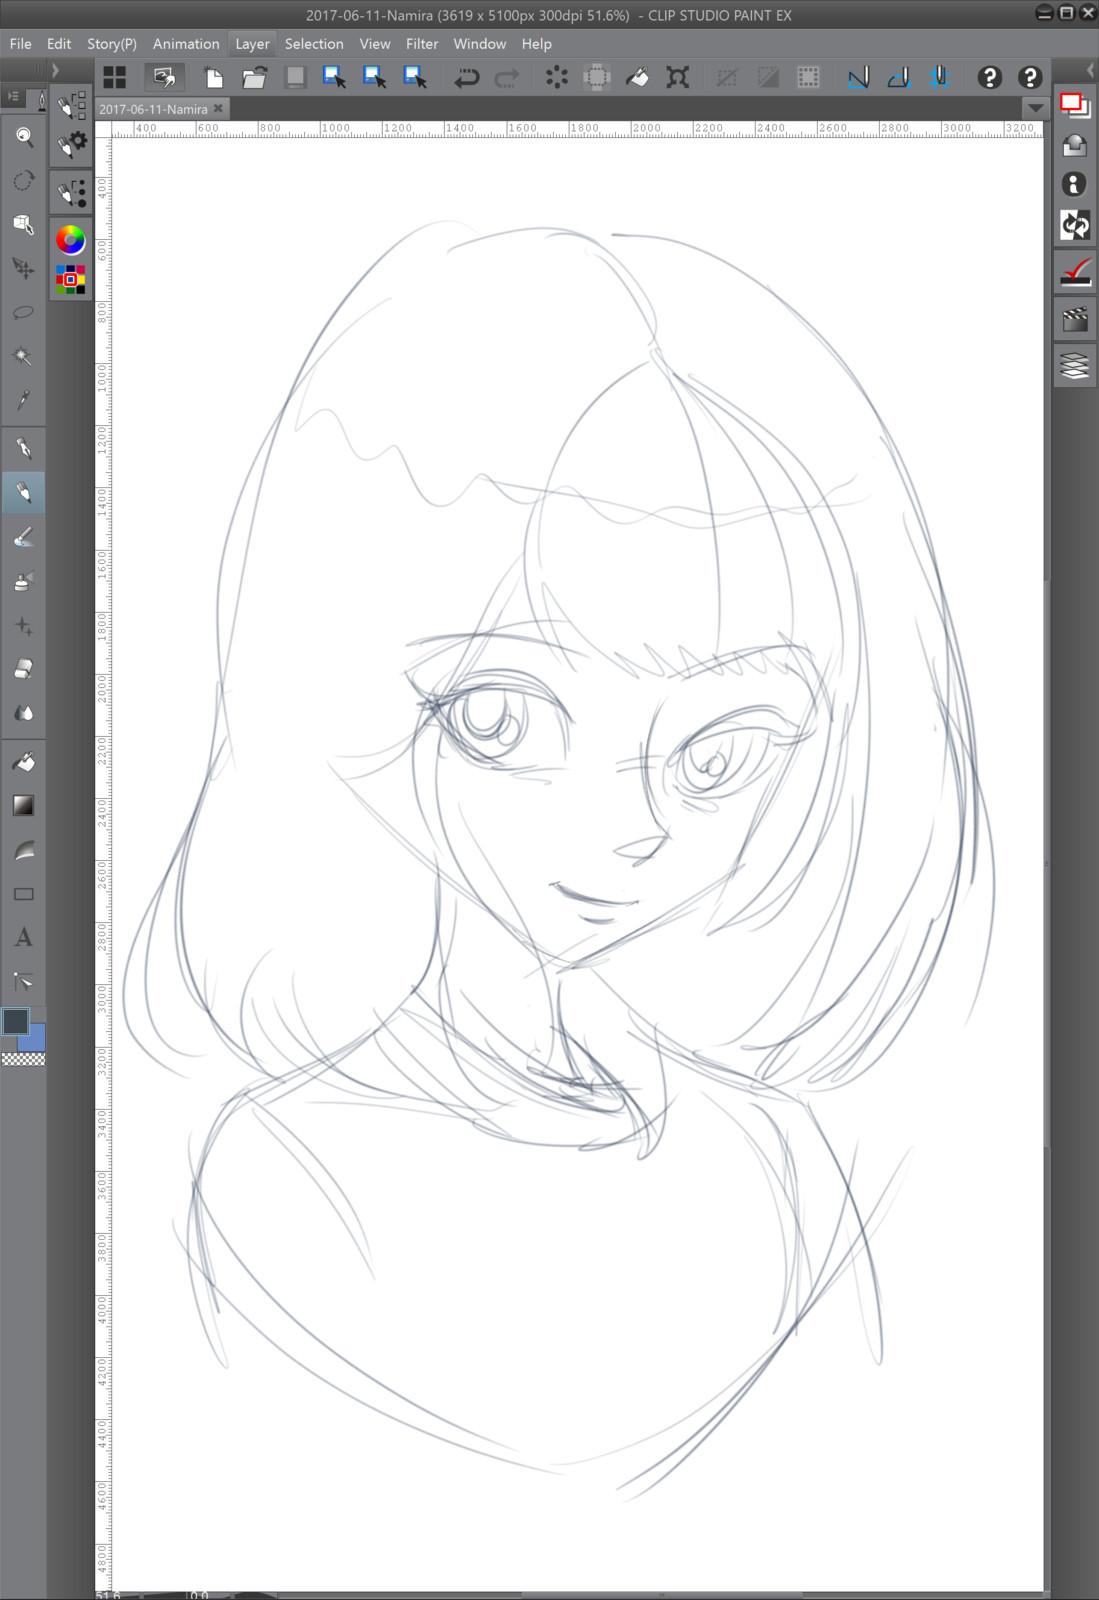 01 - The rough sketch